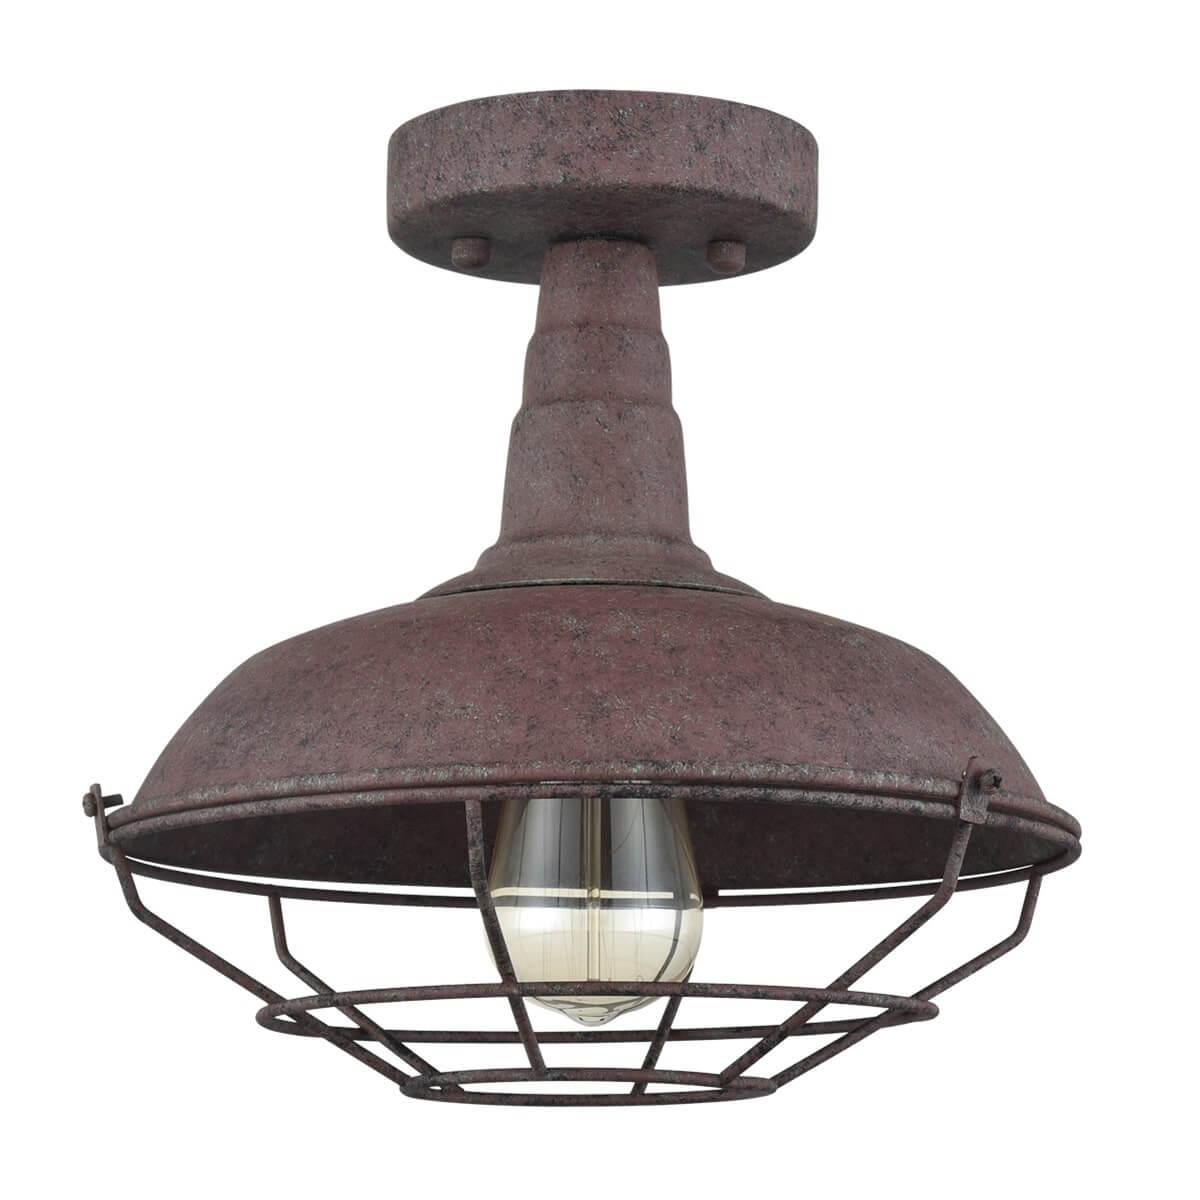 Farmhouse Semi-Flush Ceiling Lights Rust Metal Cage